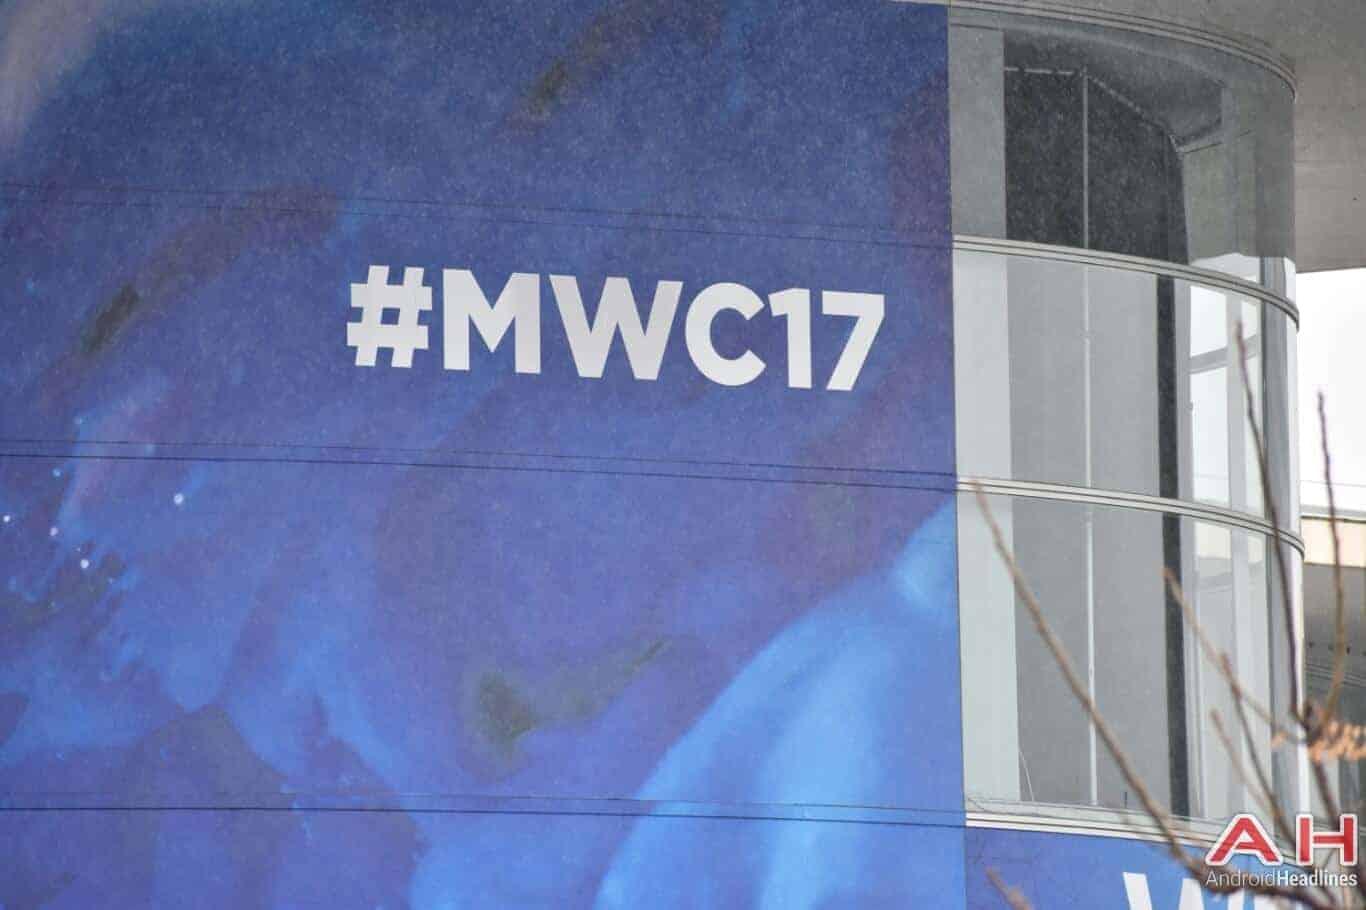 AH MWC 2017 signage 2